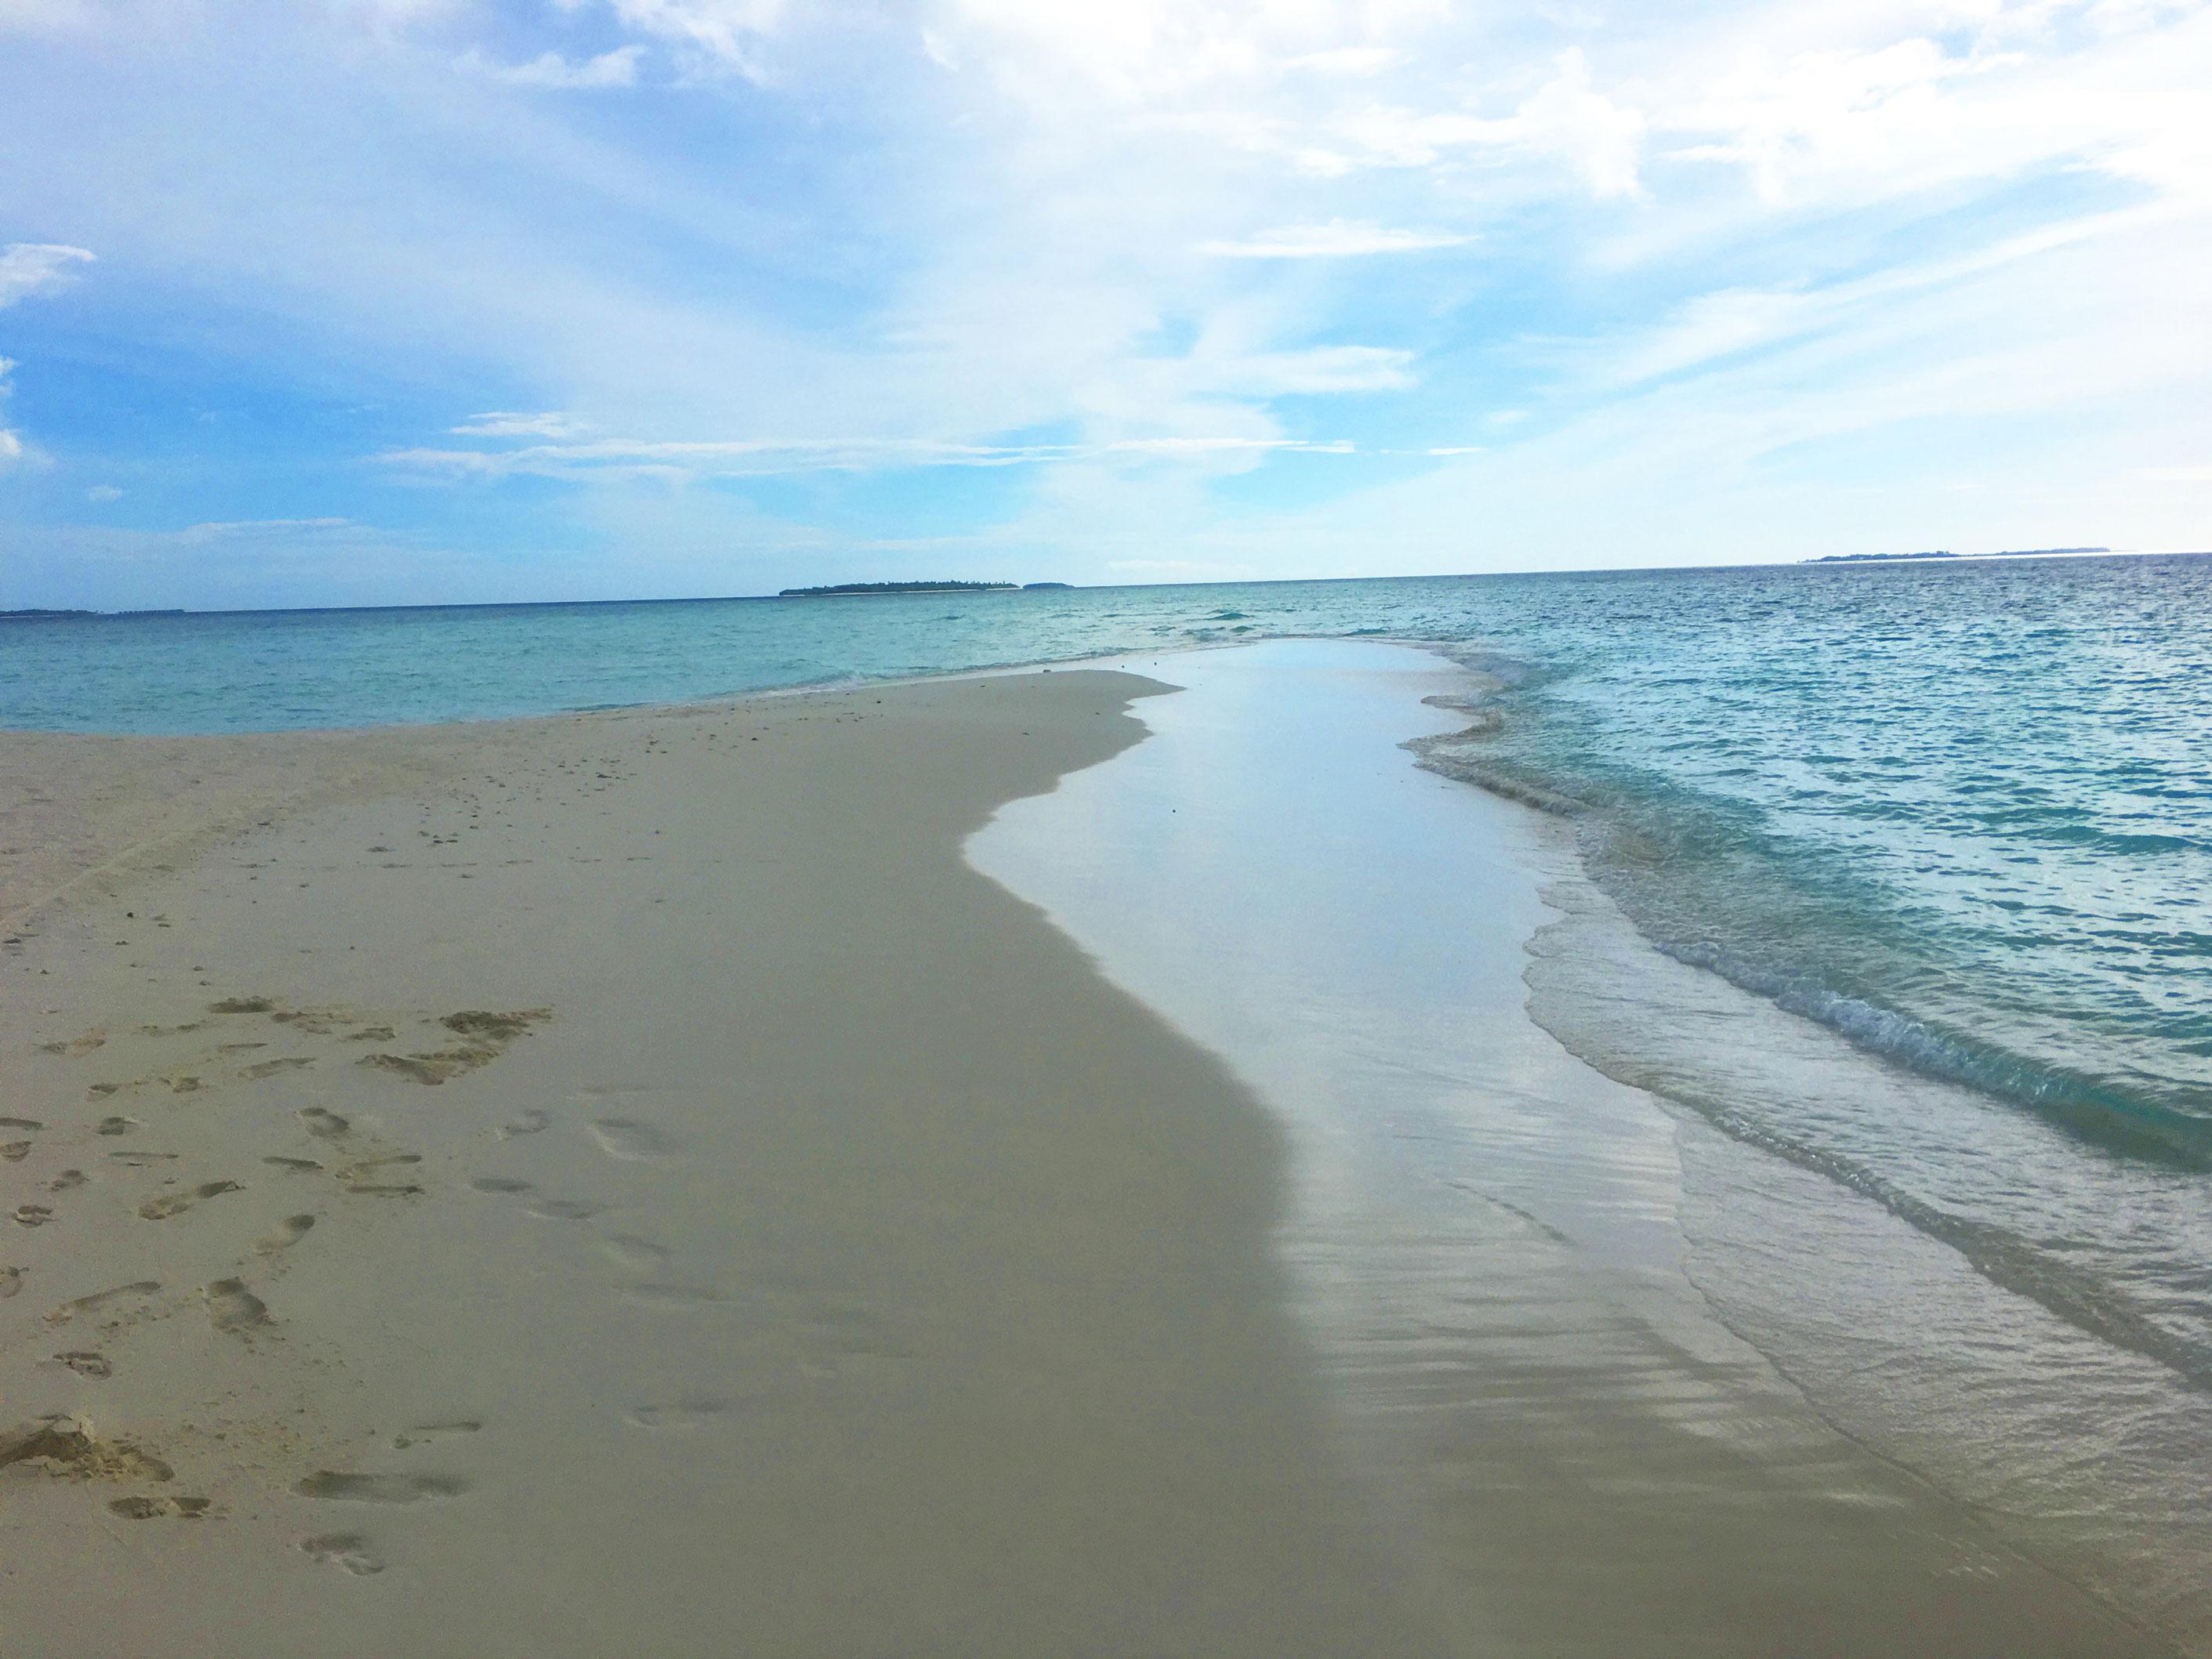 Maldive Dhigali Resort - Spiagge Bianche